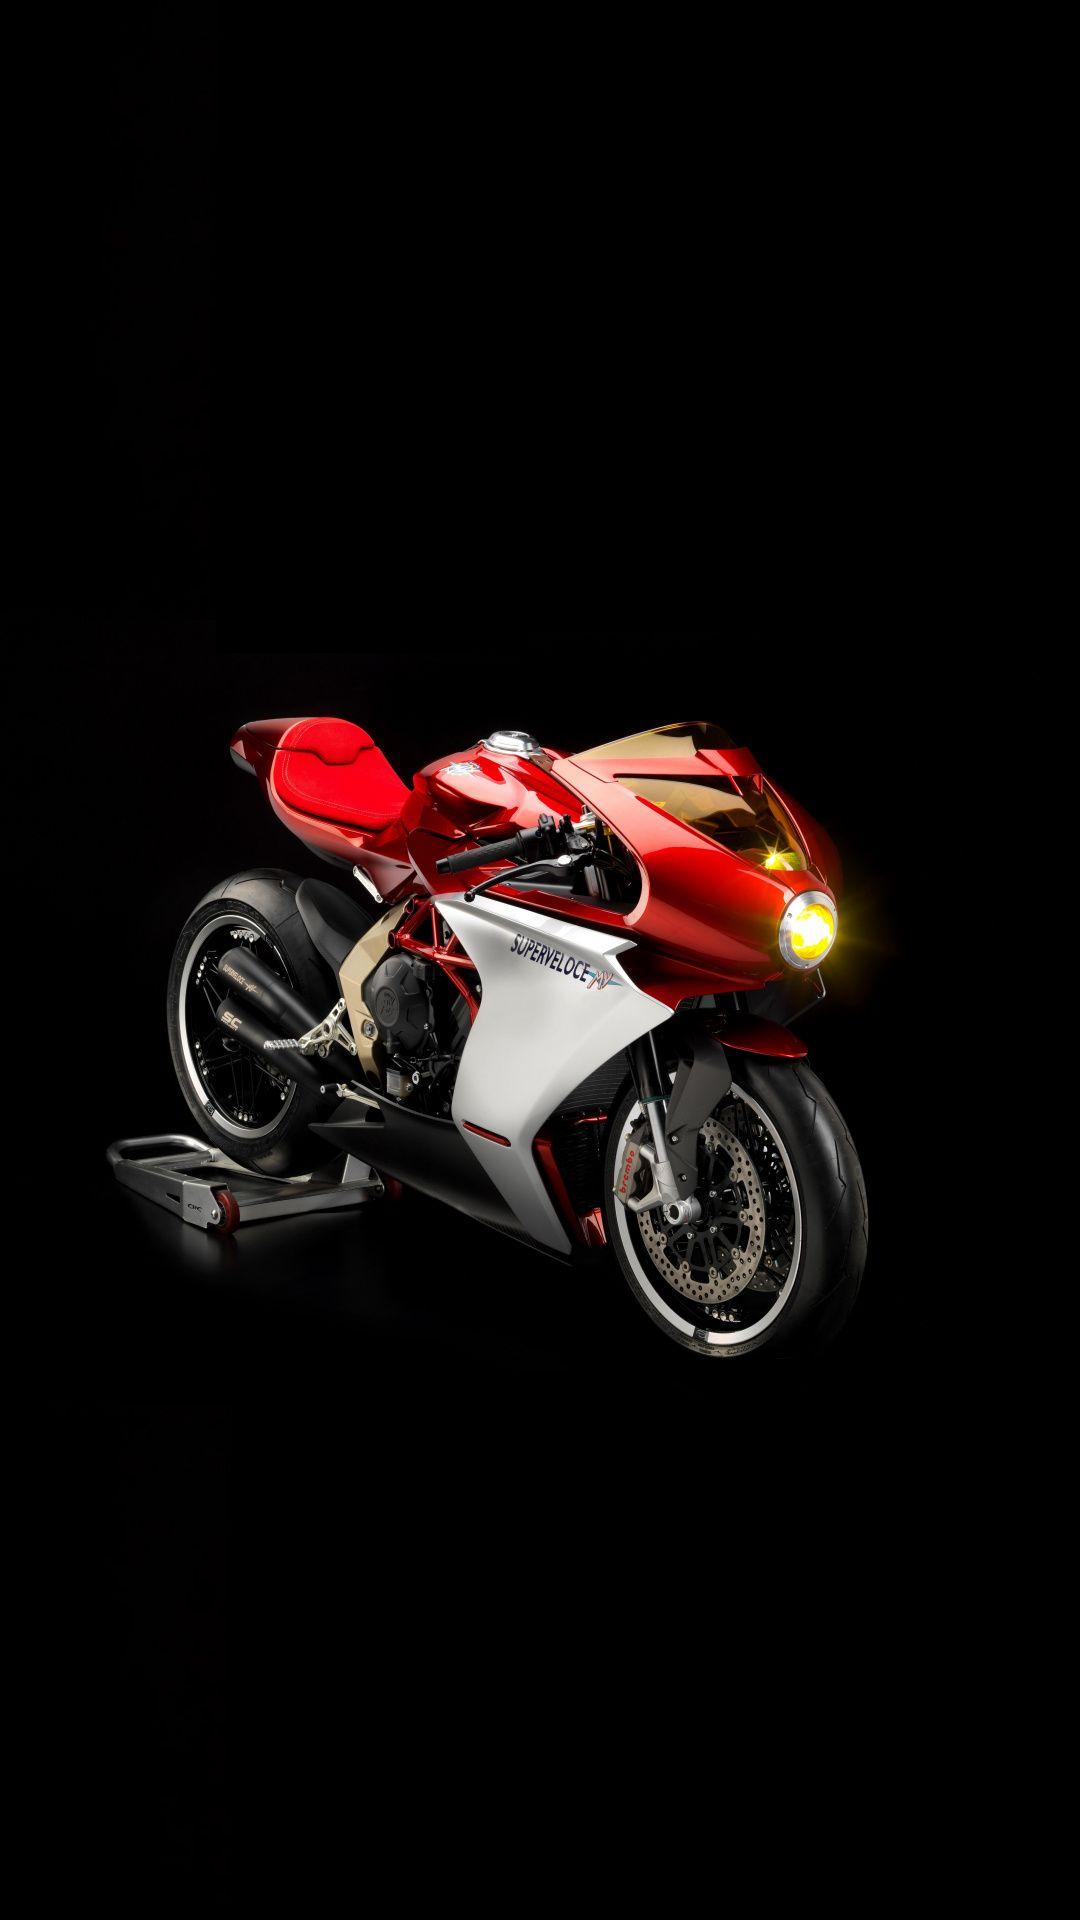 Sports Bike Mv Agusta Superveloce 800 Wallpaper Mobil Sport